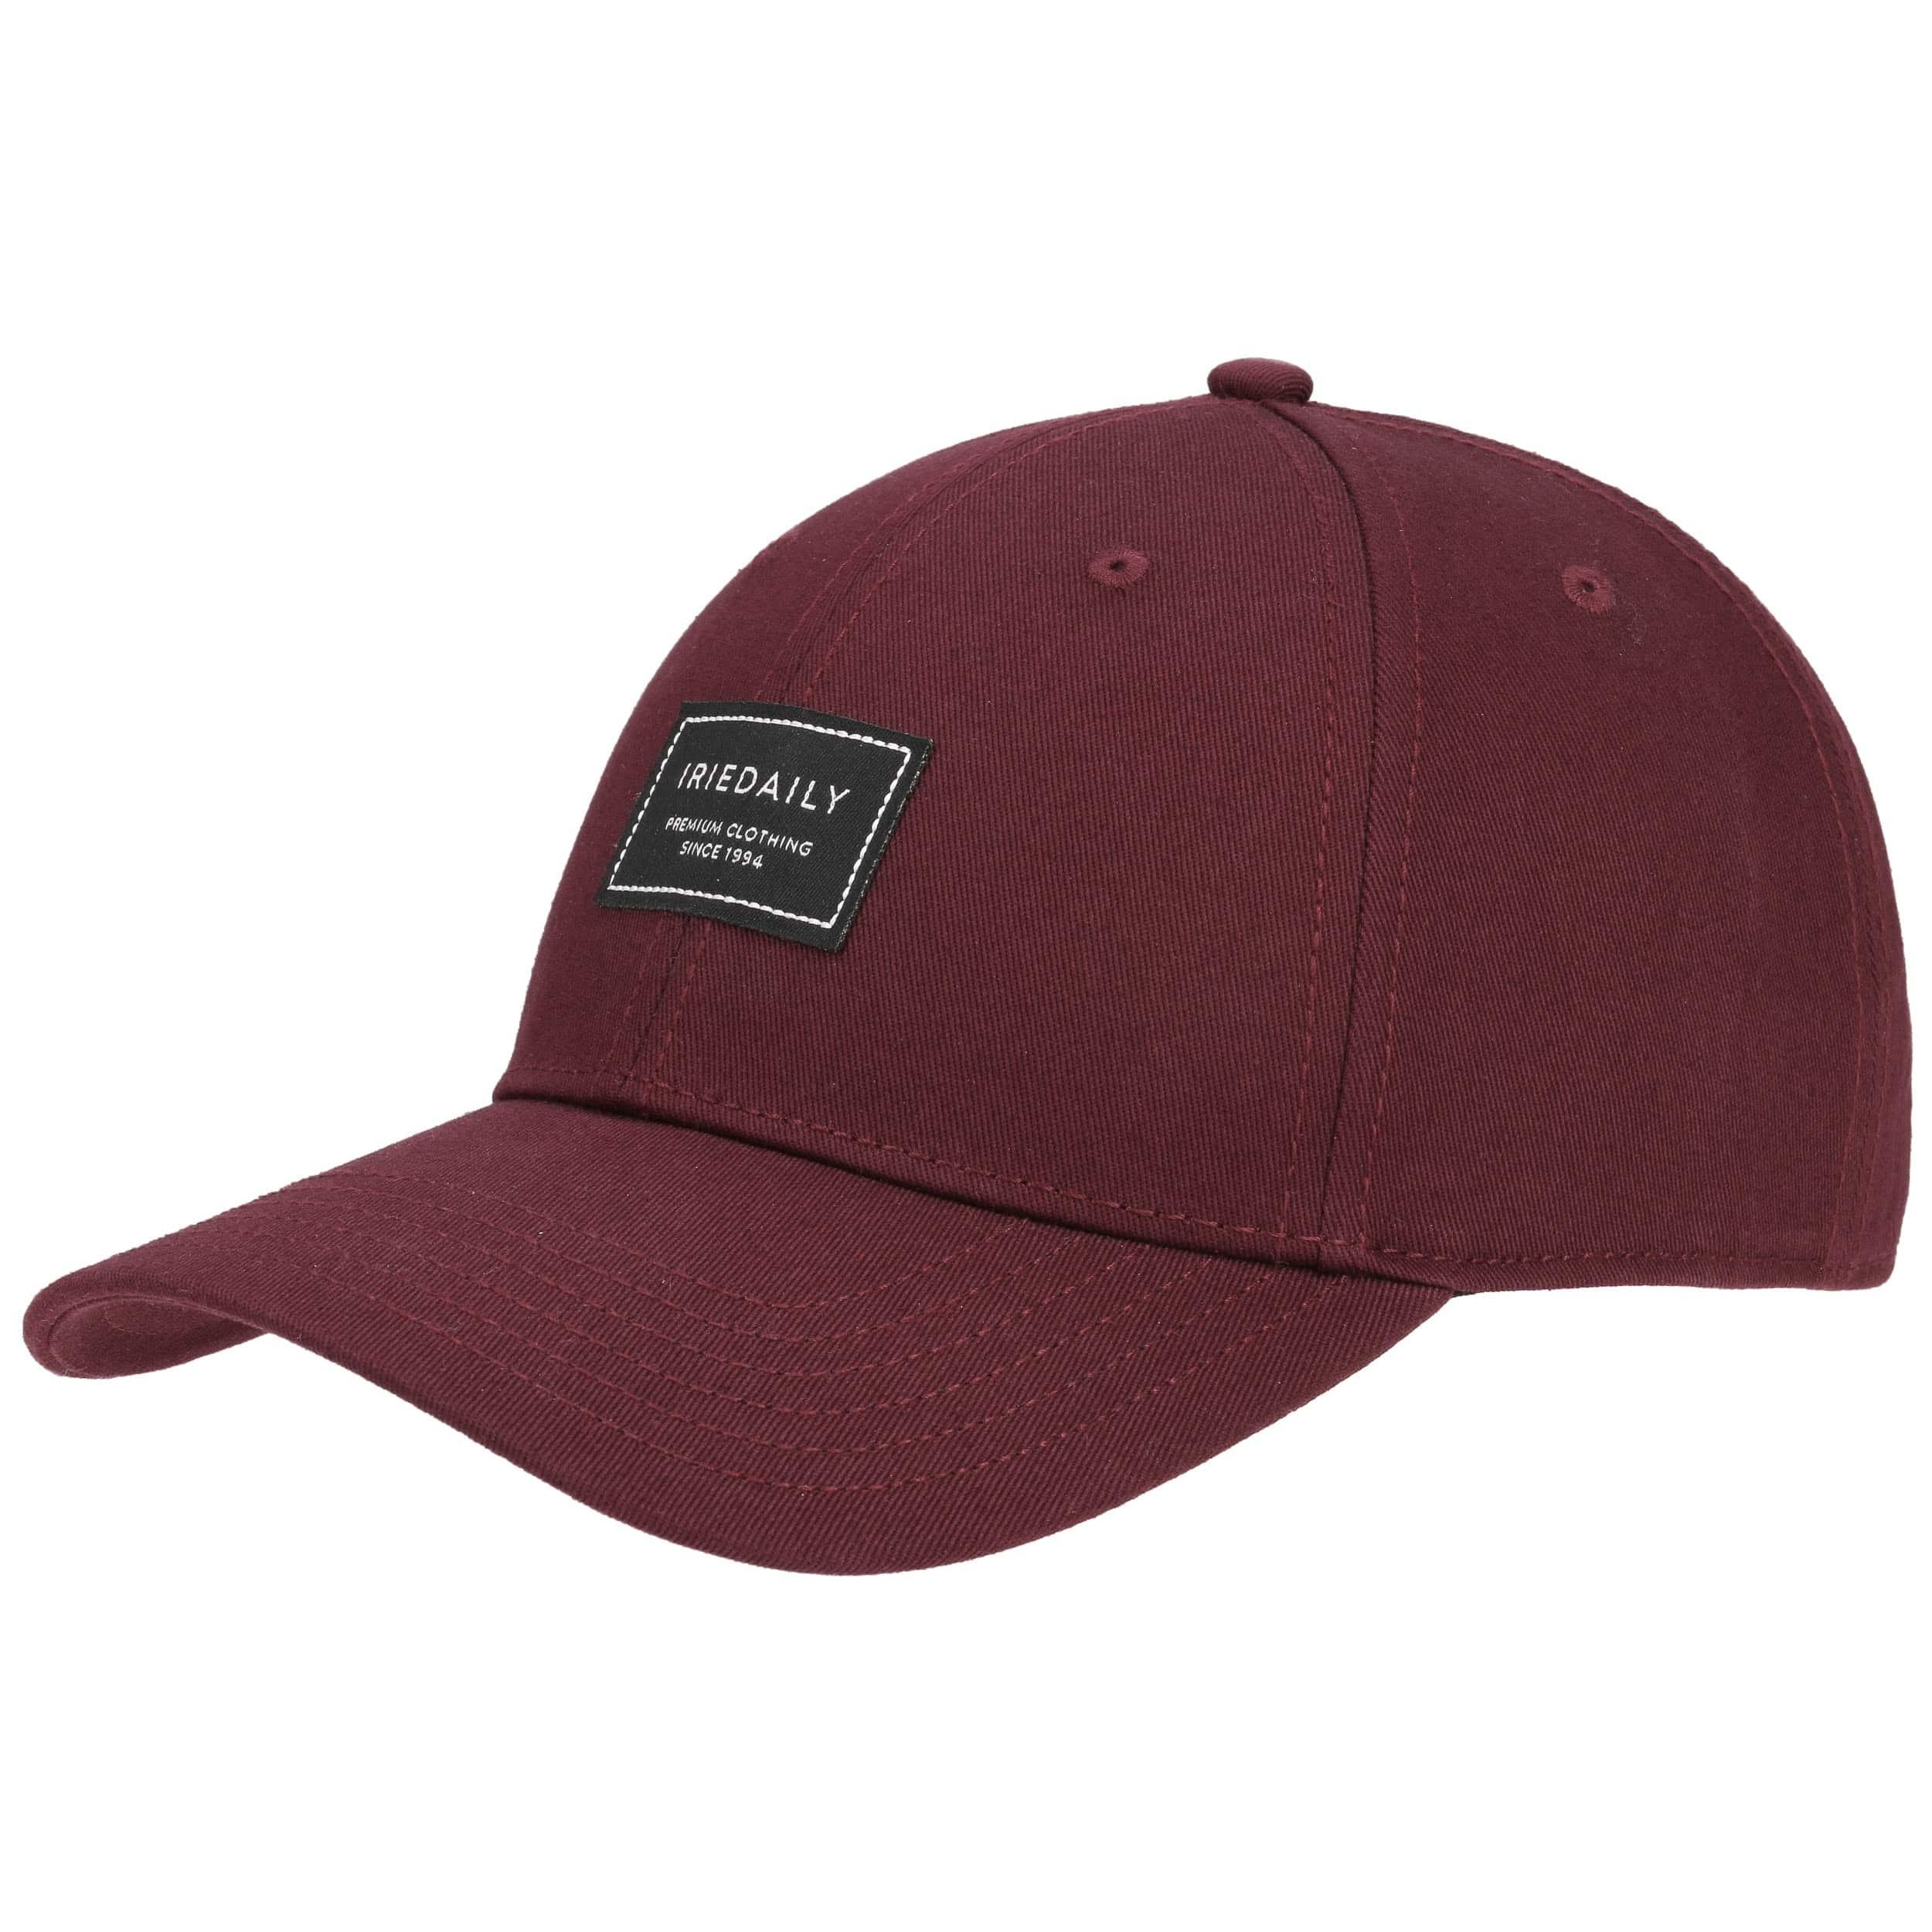 Gorra Daily Club Strapback by iriedaily - Gorras - sombreroshop.es 4030633ceef